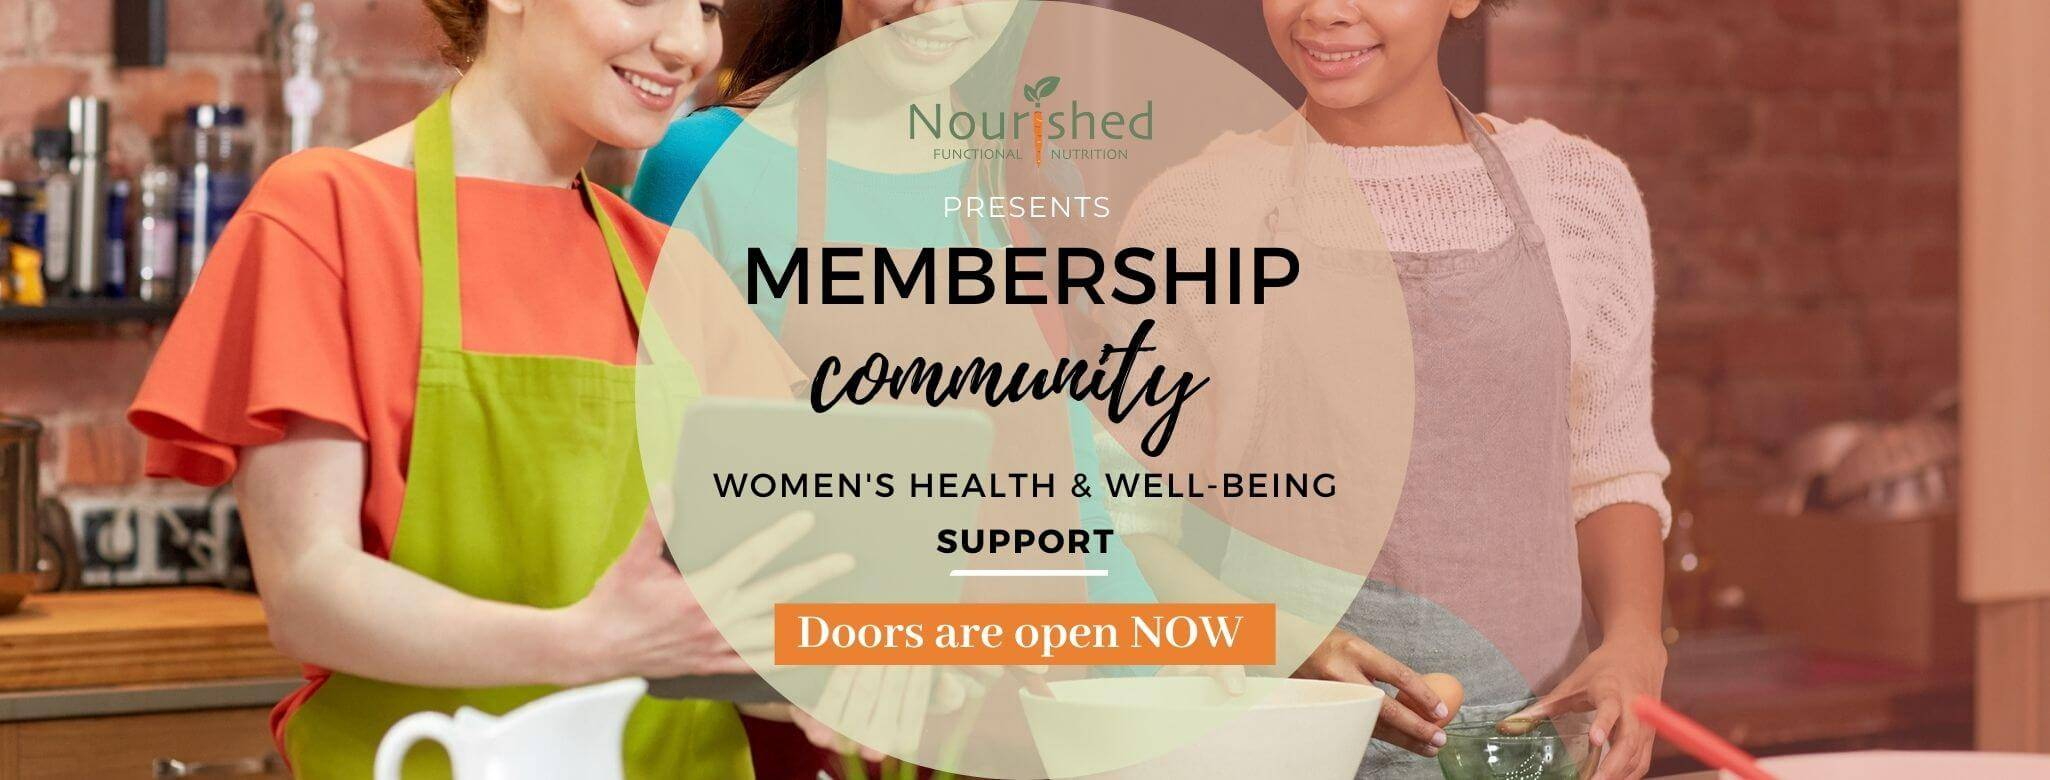 membership community women's health